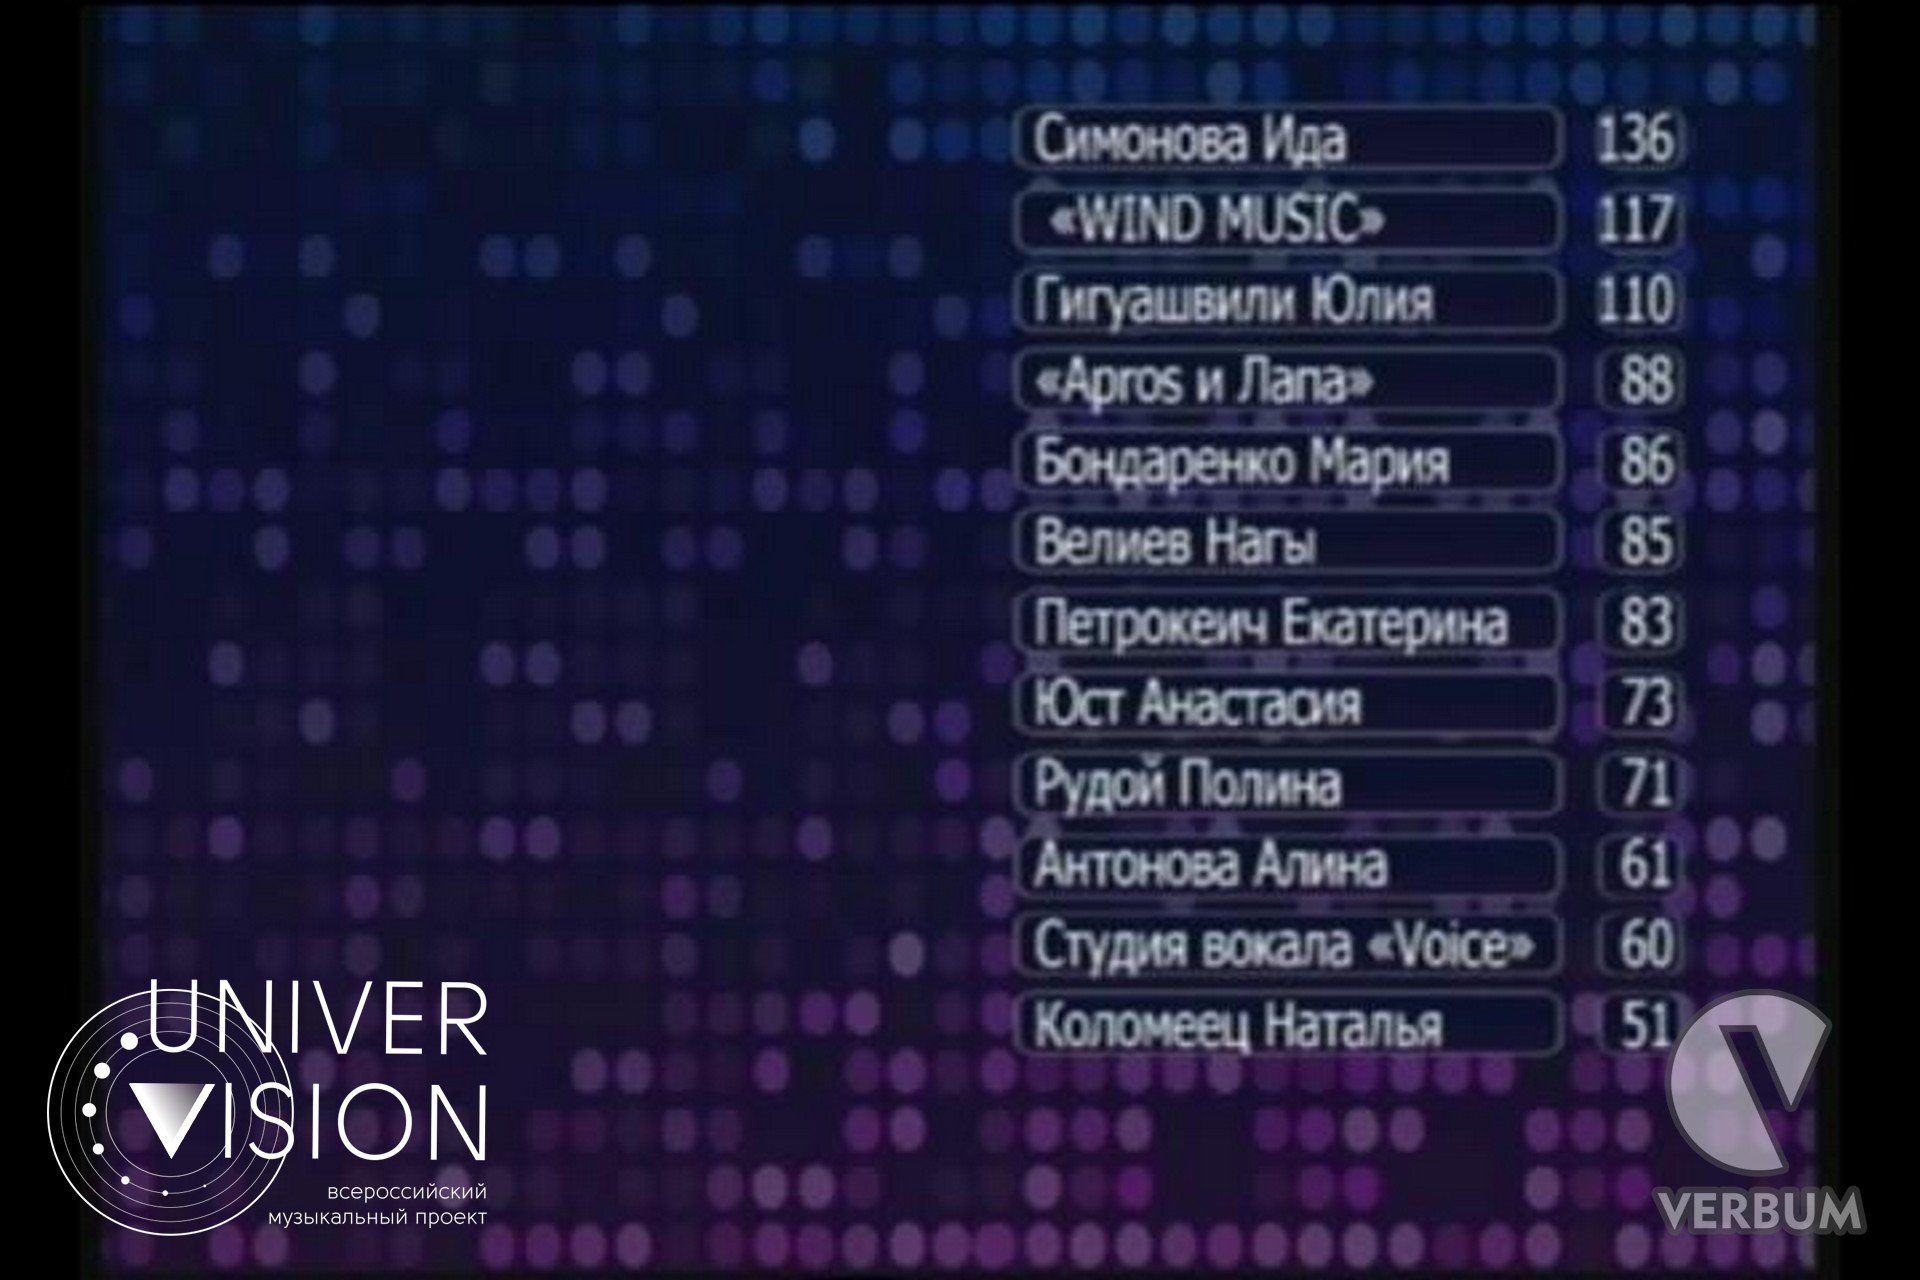 Univervision 2015.m2ts snapshot 02.52.20 2015.11.25 09.02.54